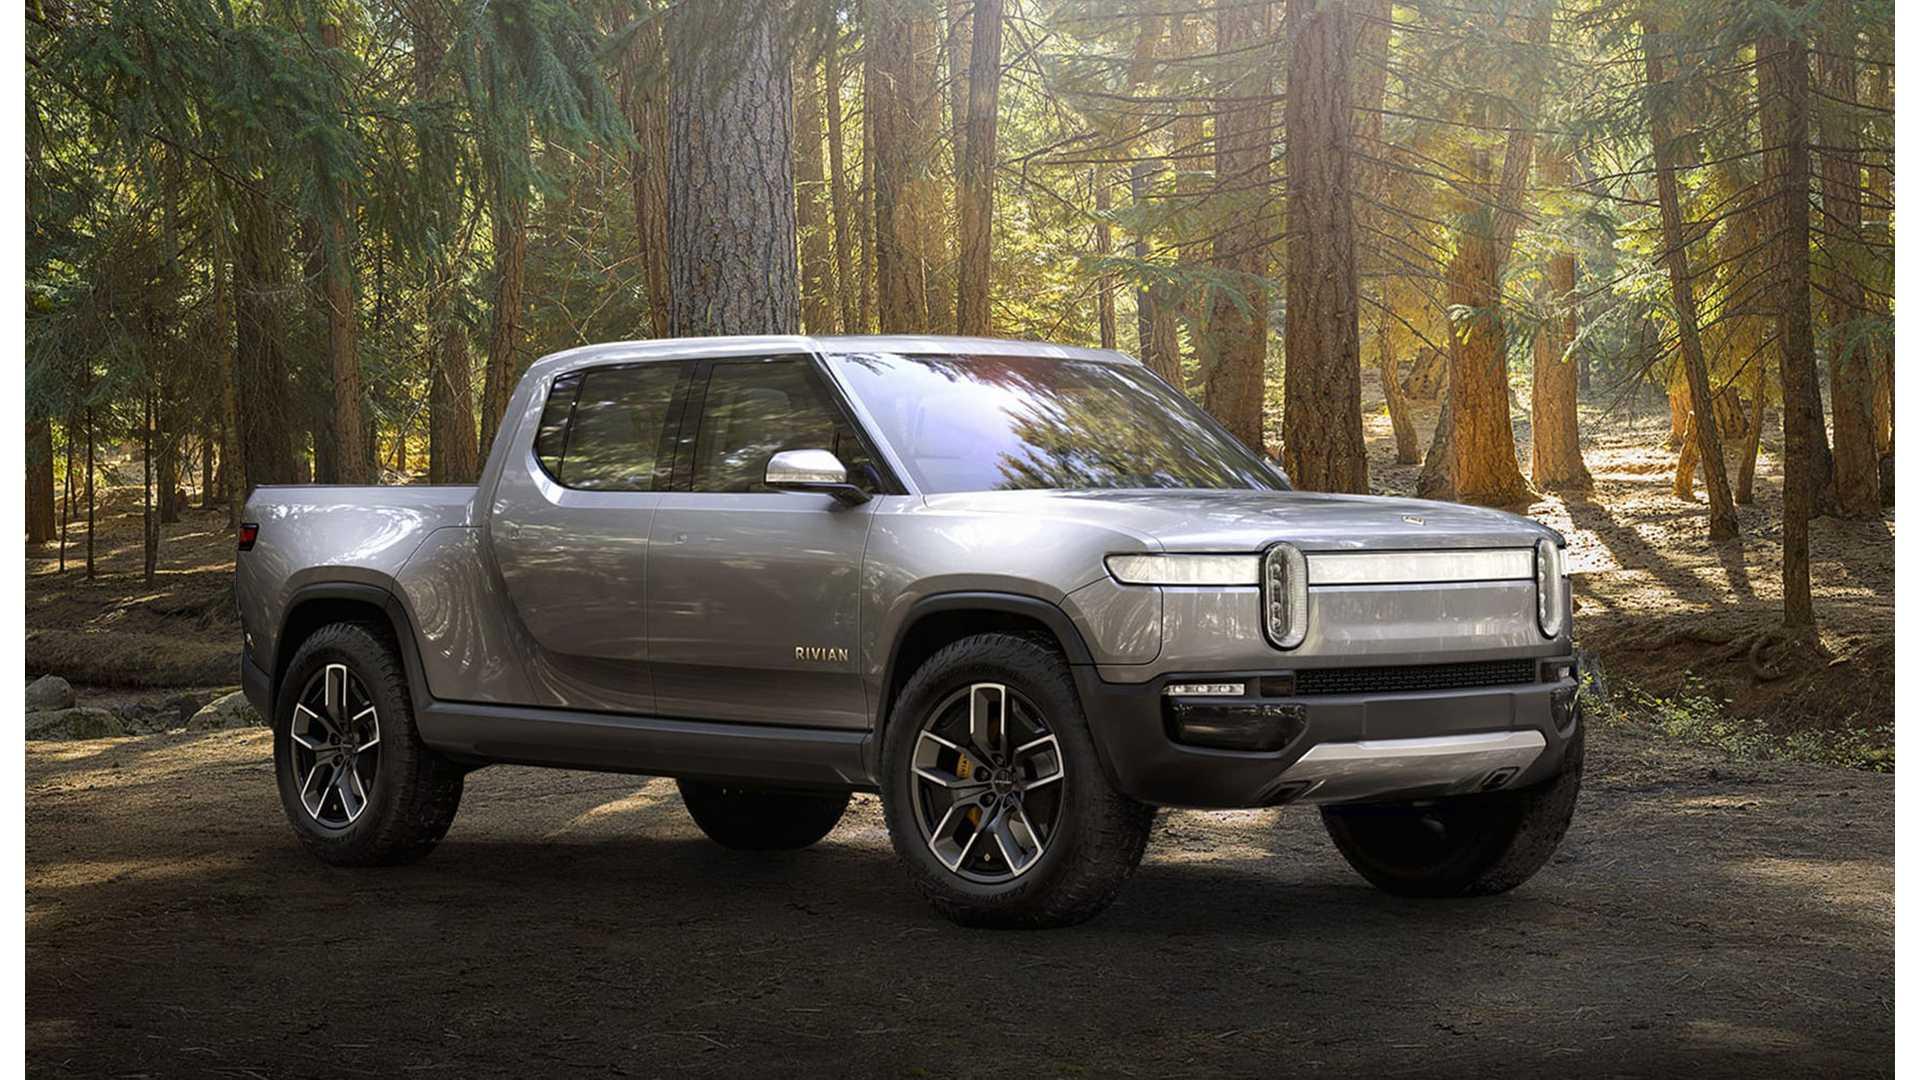 rivian-r1t-electric-pickup-truck